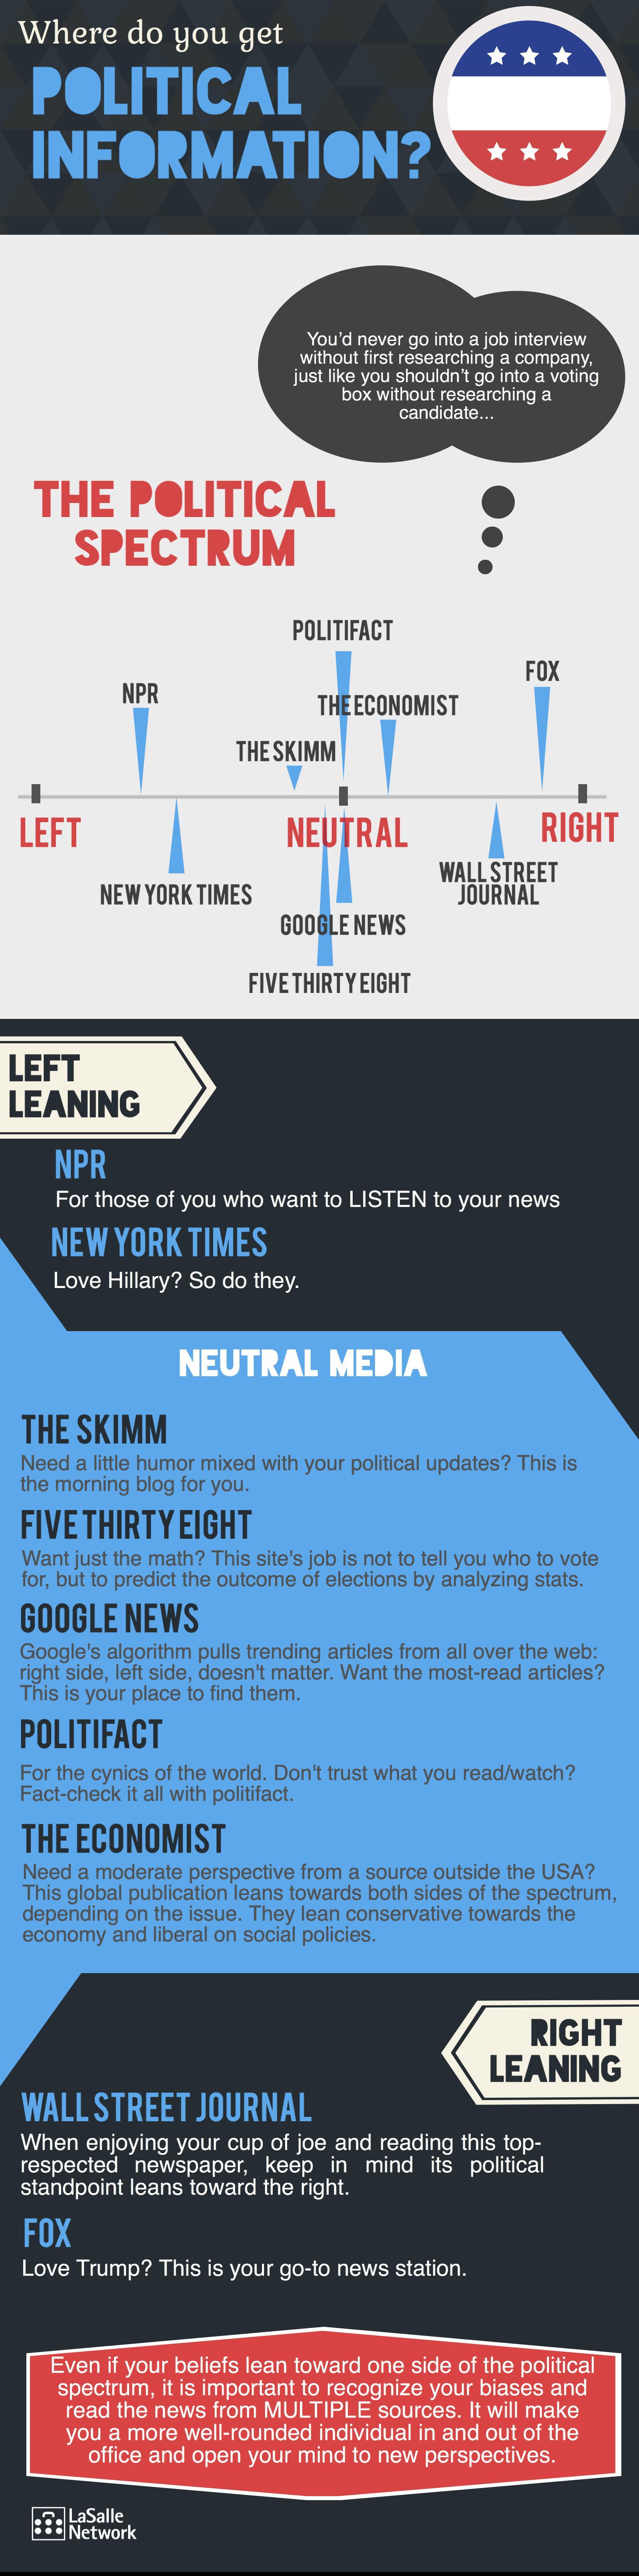 political information